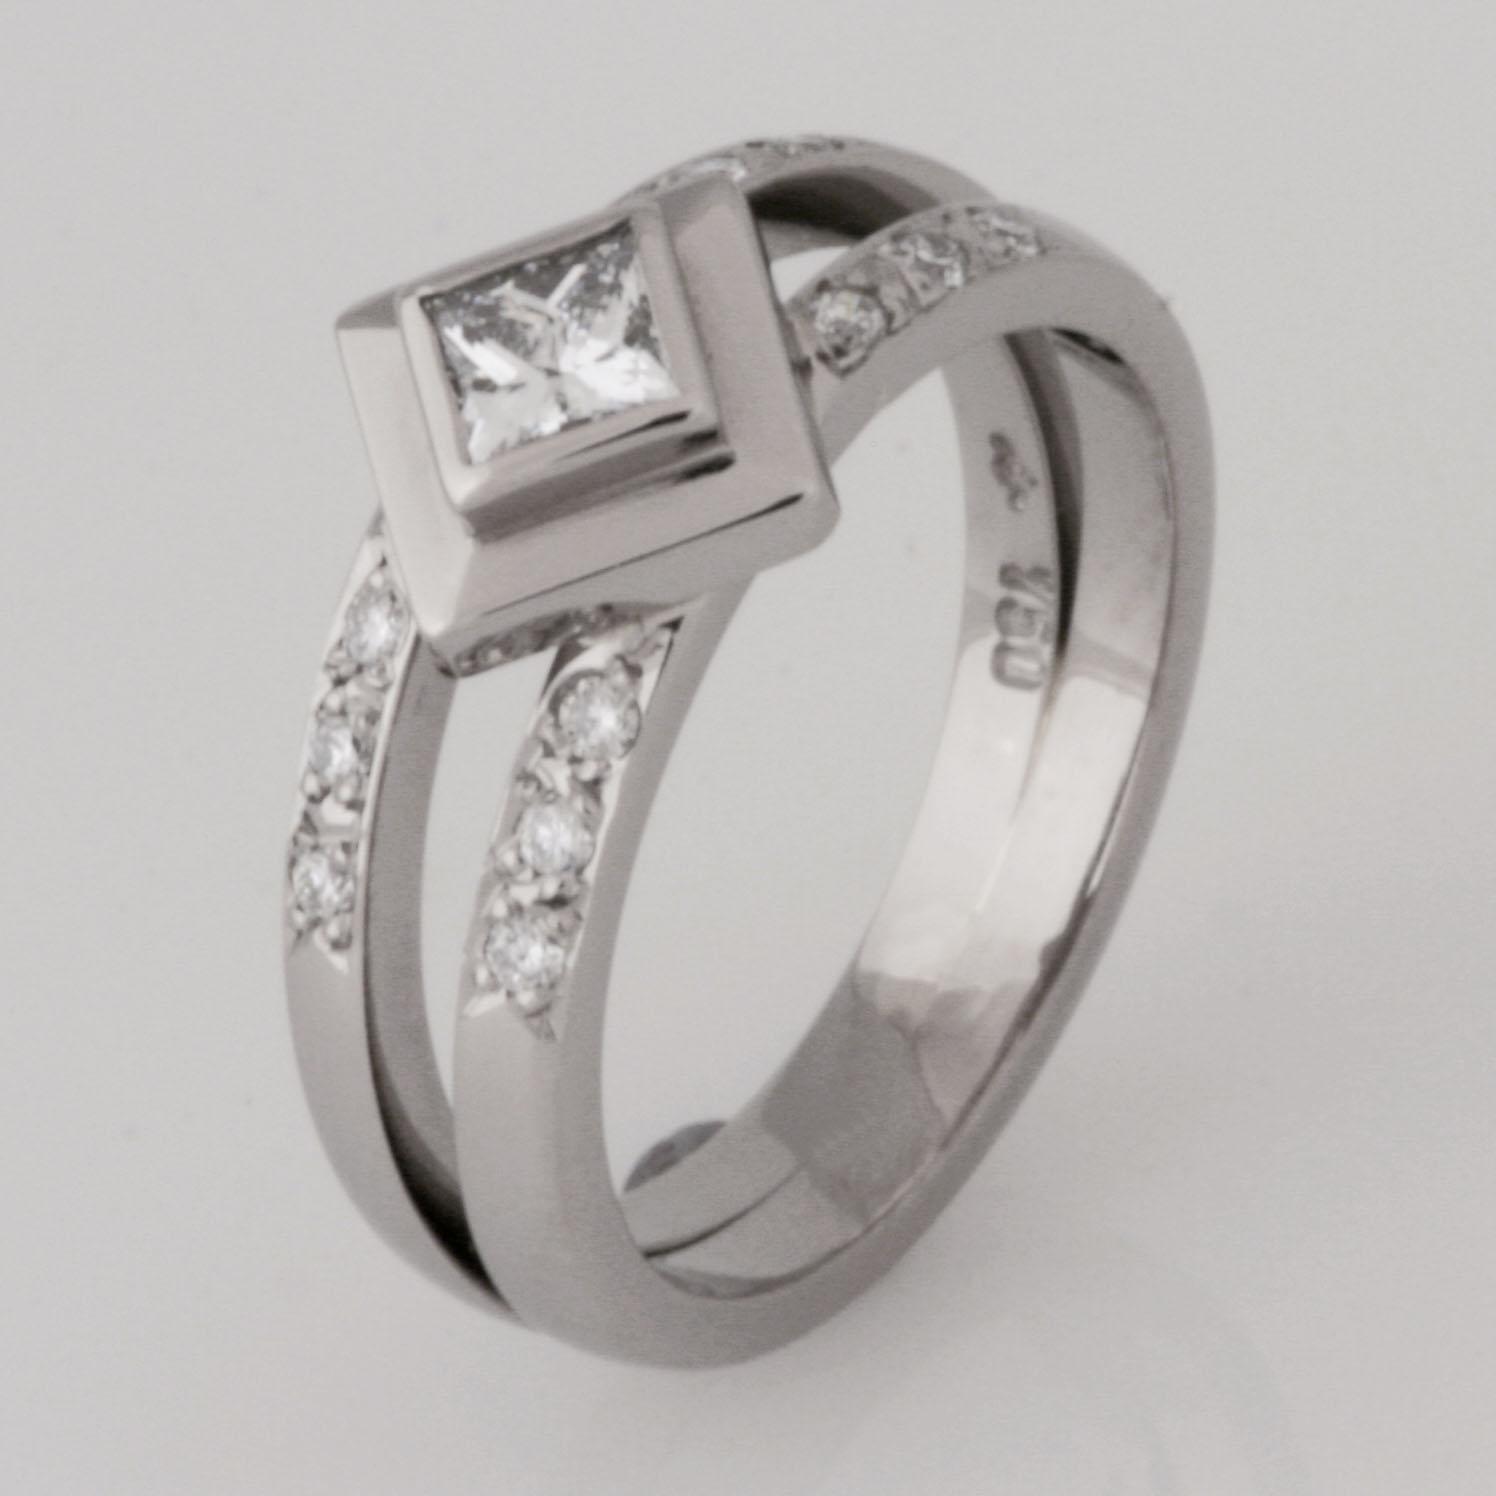 Handmade ladies 18ct white gold princess cut diamond engagement ring